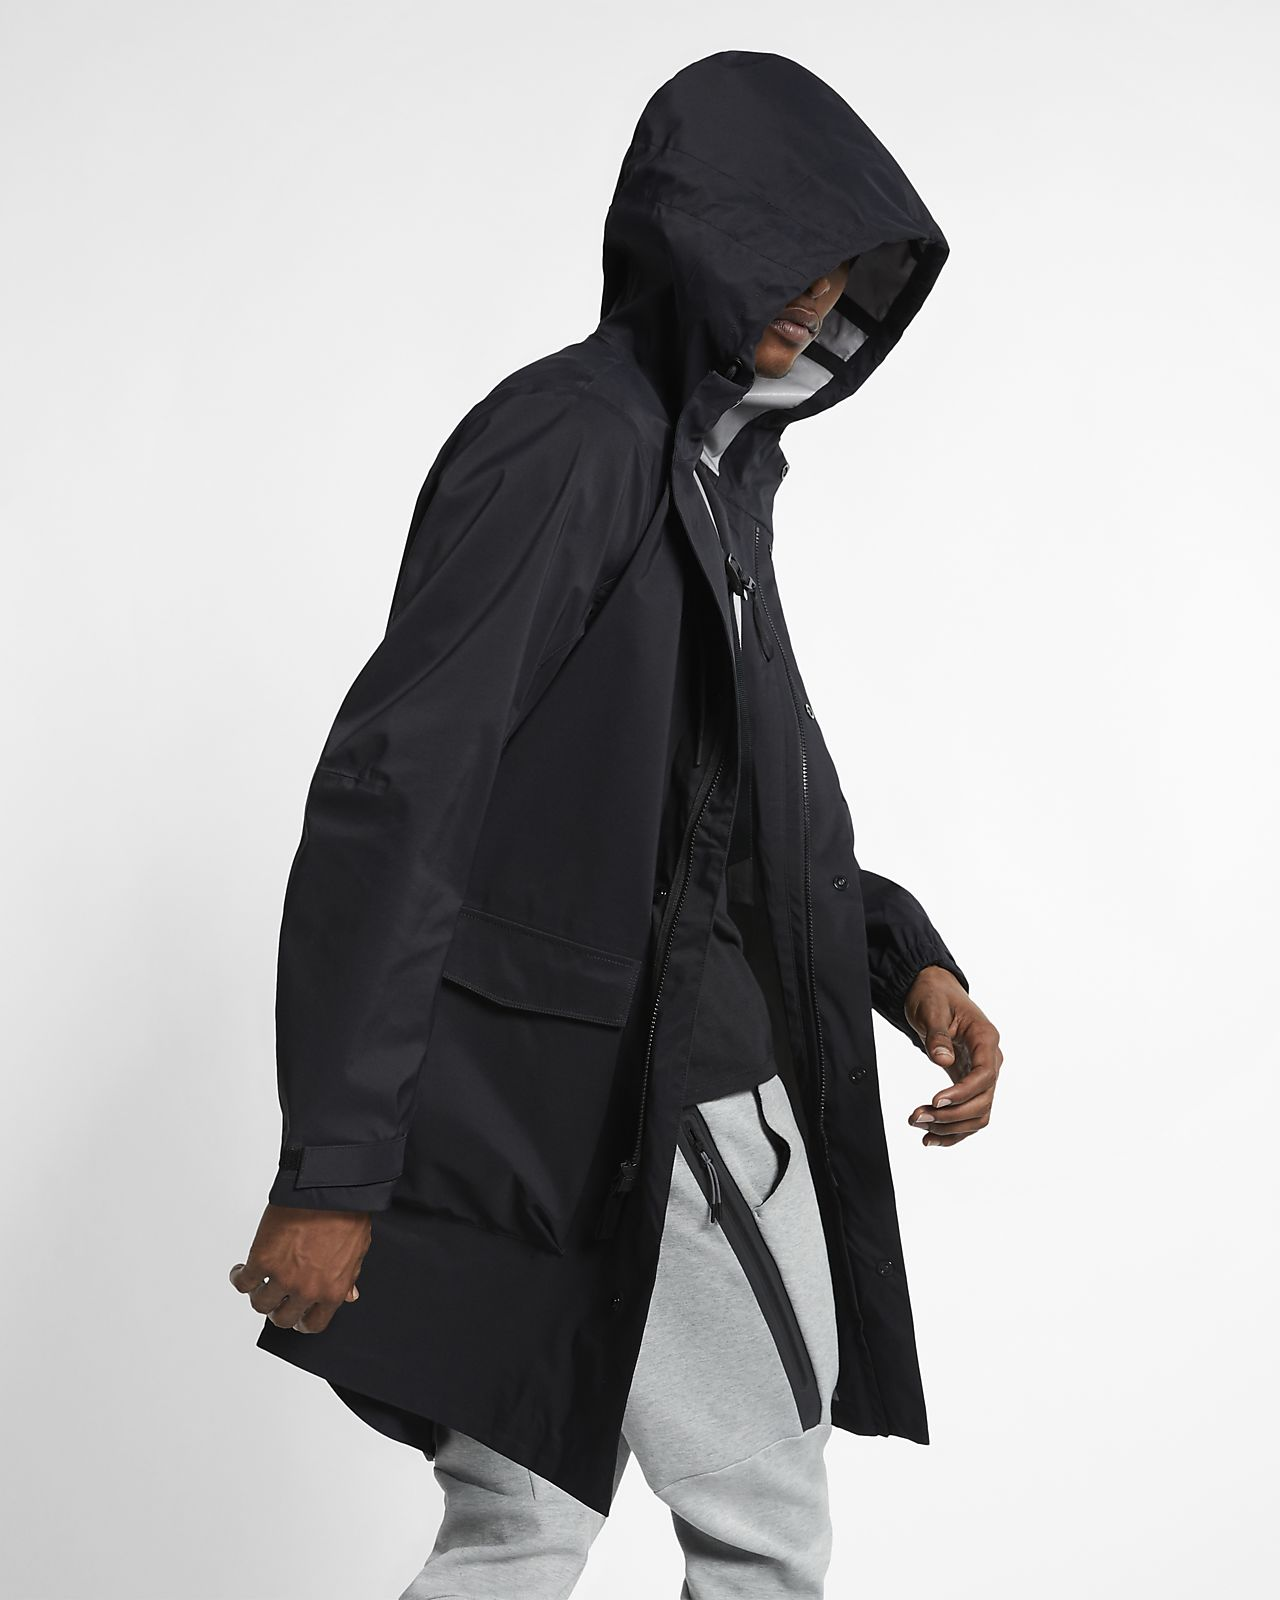 NikeLab Collection Men's Parka